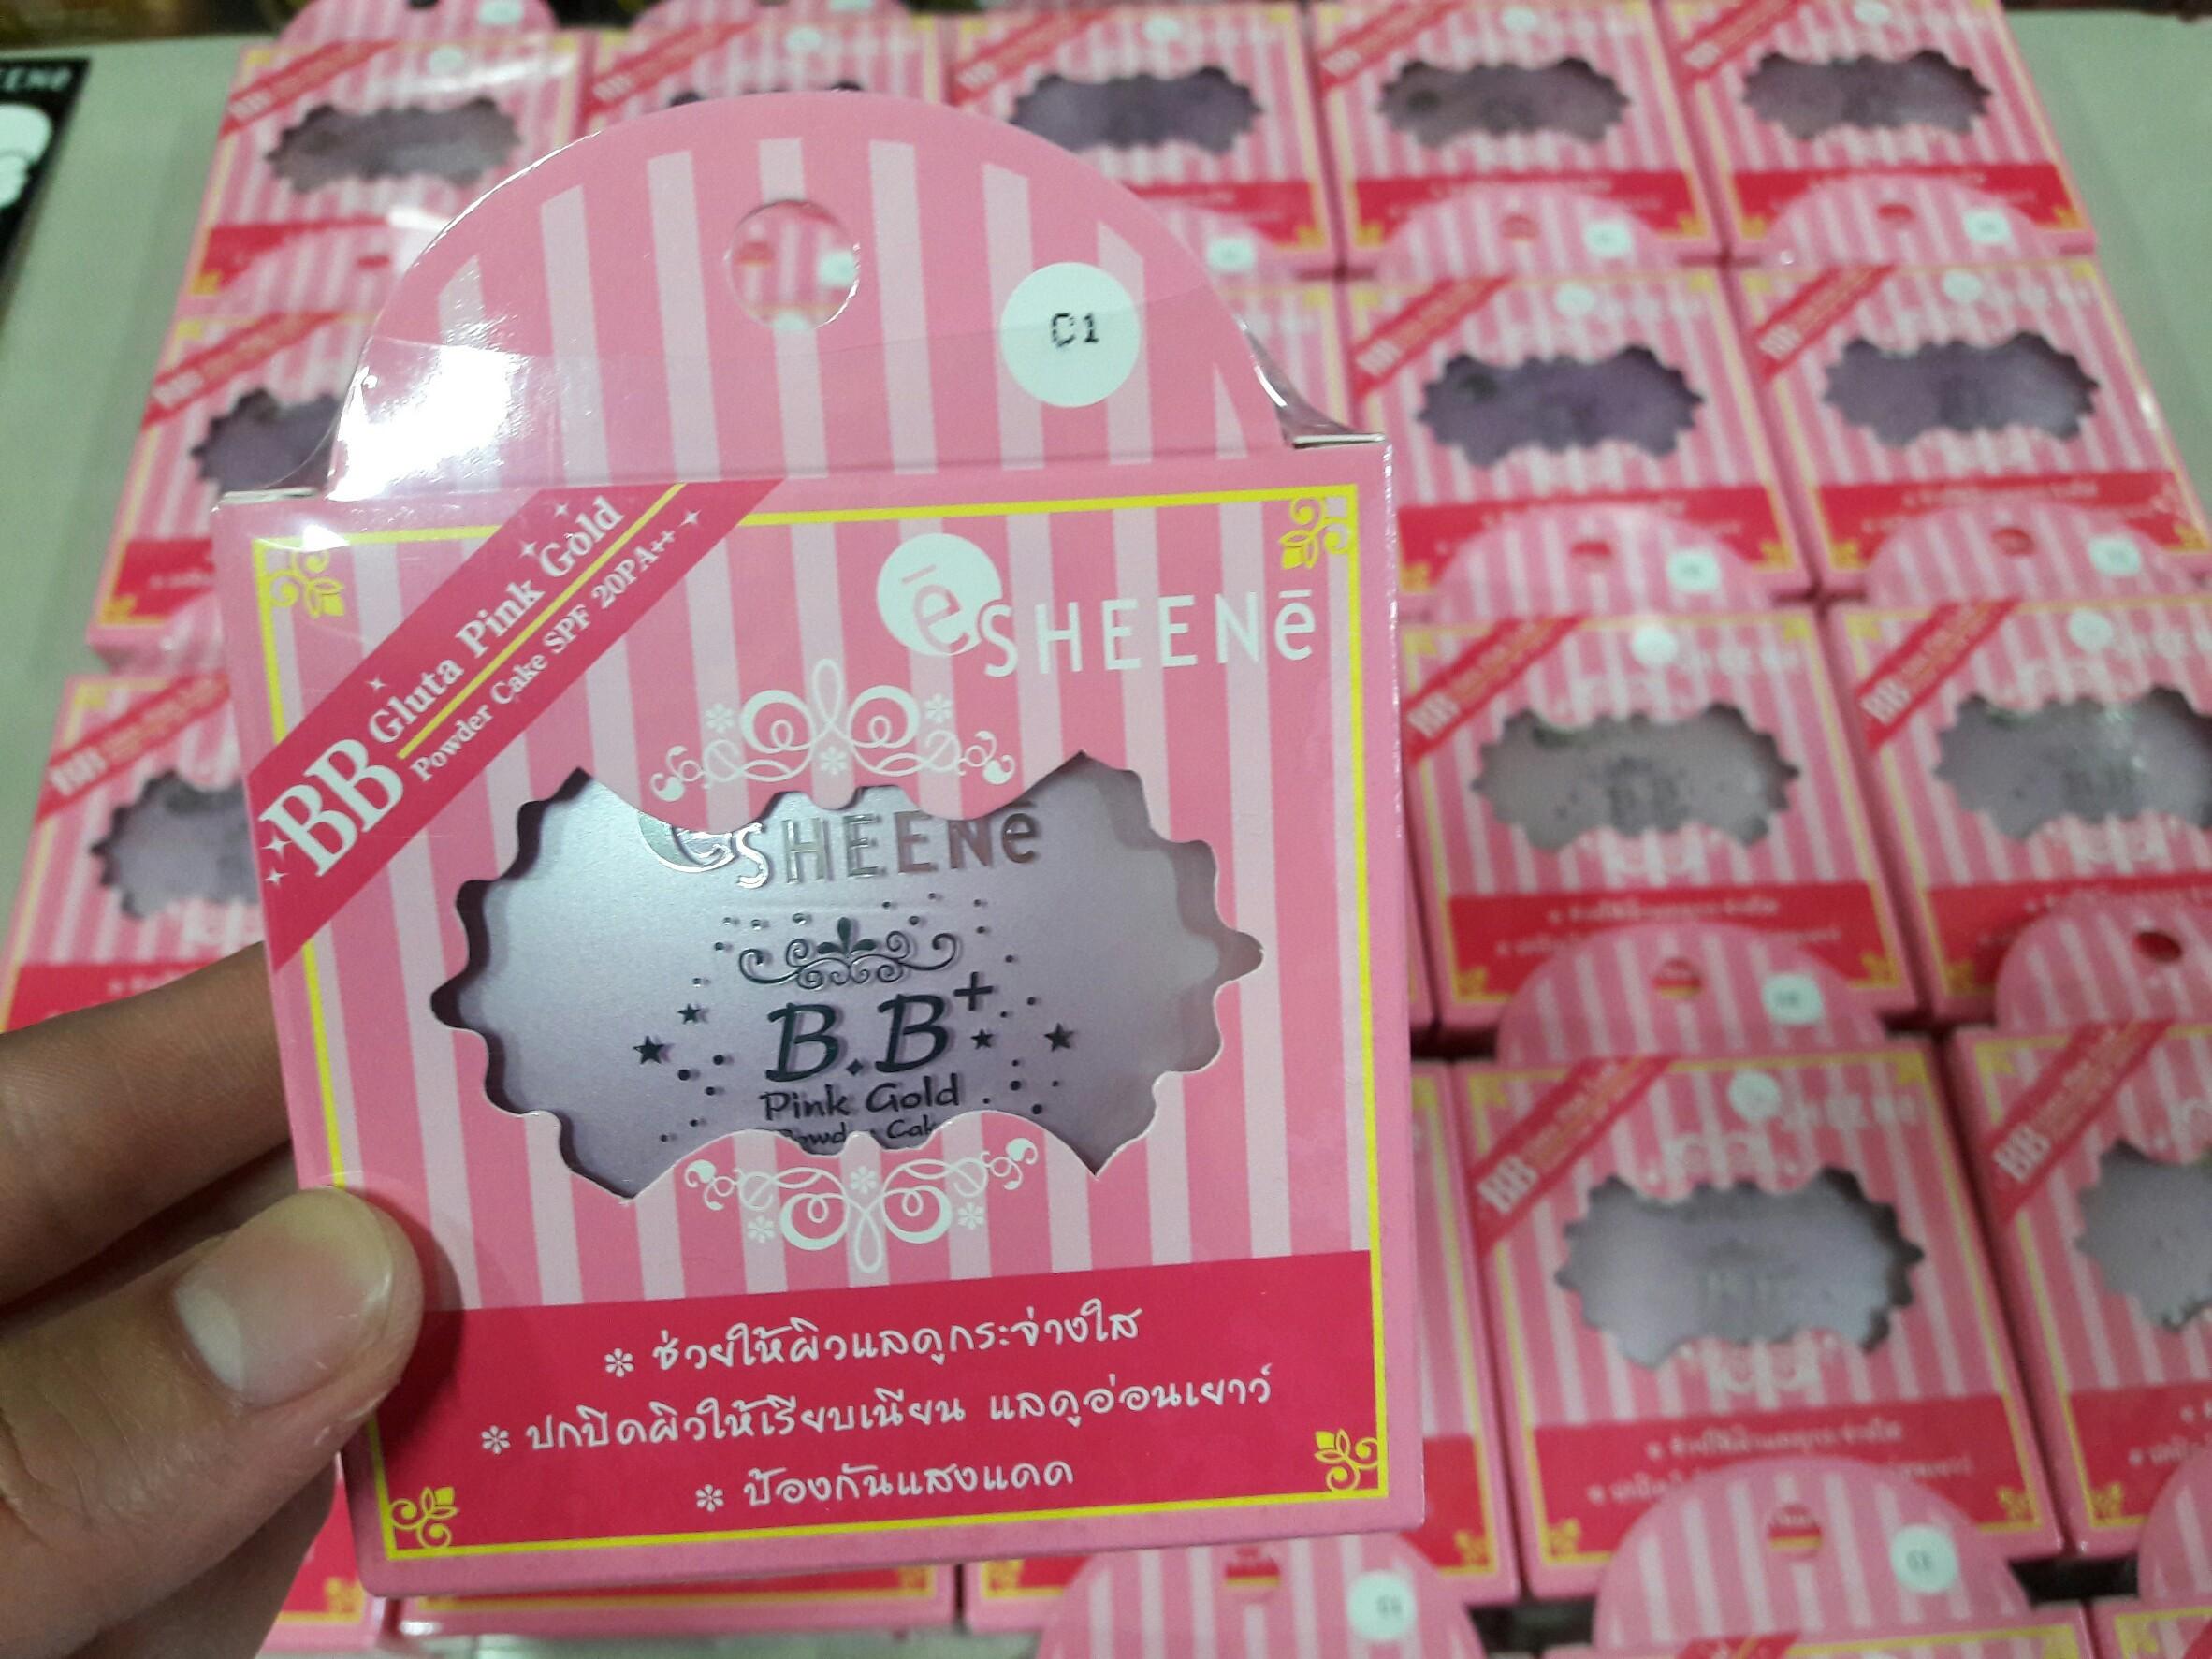 SHEENe BB PINK GOLD POWDER CAKE SPF 20 PA ++ ชีนเน่ บีบี พิงค์โกล์ด พาวเดอร์ เค้ก เอส พี เอฟ 20 พีเอ++